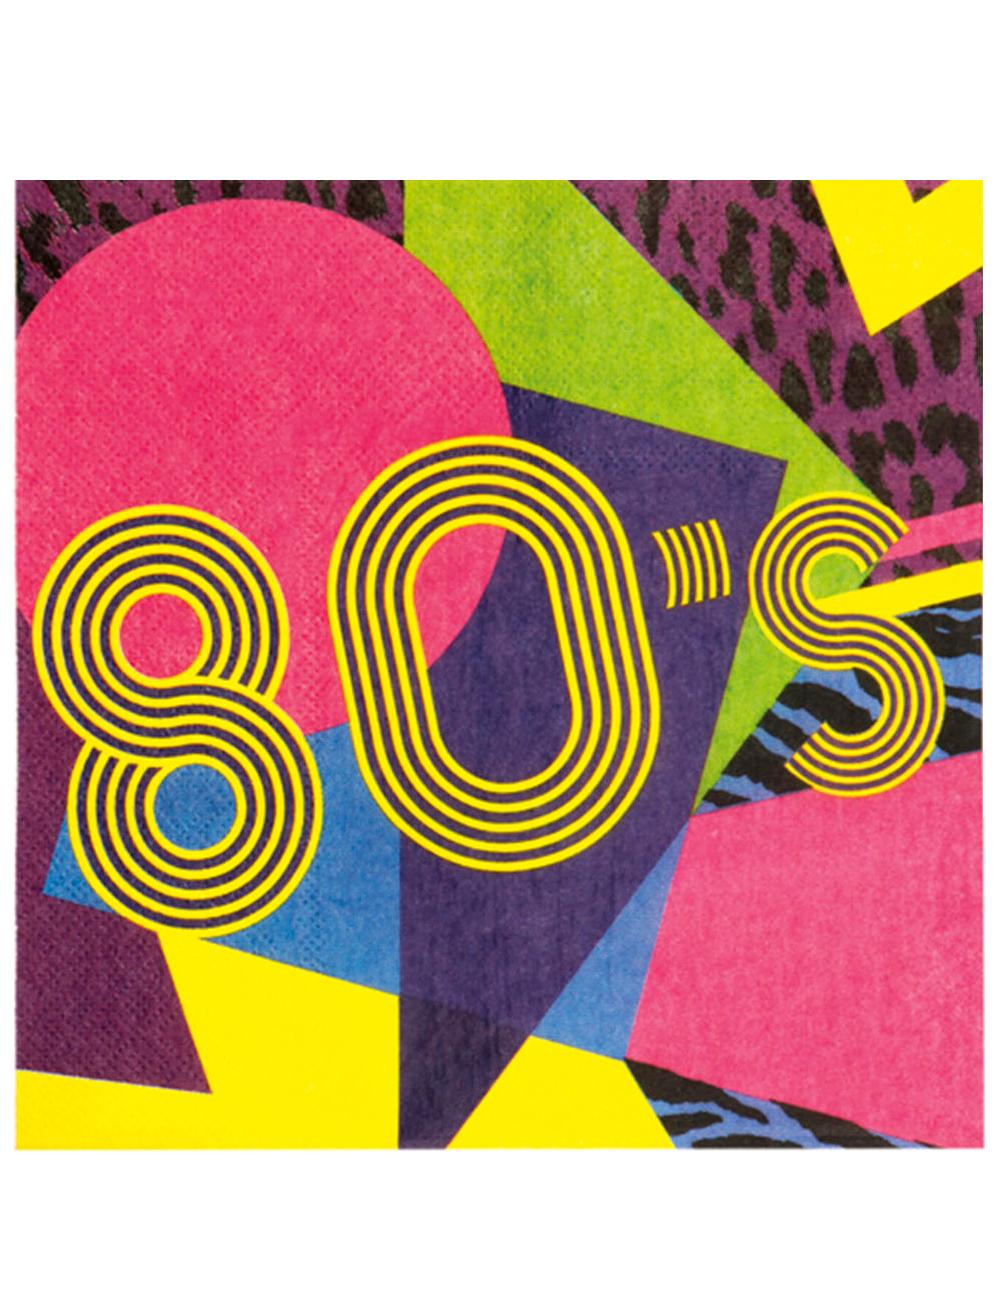 12 tovaglioli di carta anni 80 Party Addobbie vestiti di carnevale online  Vegaoo